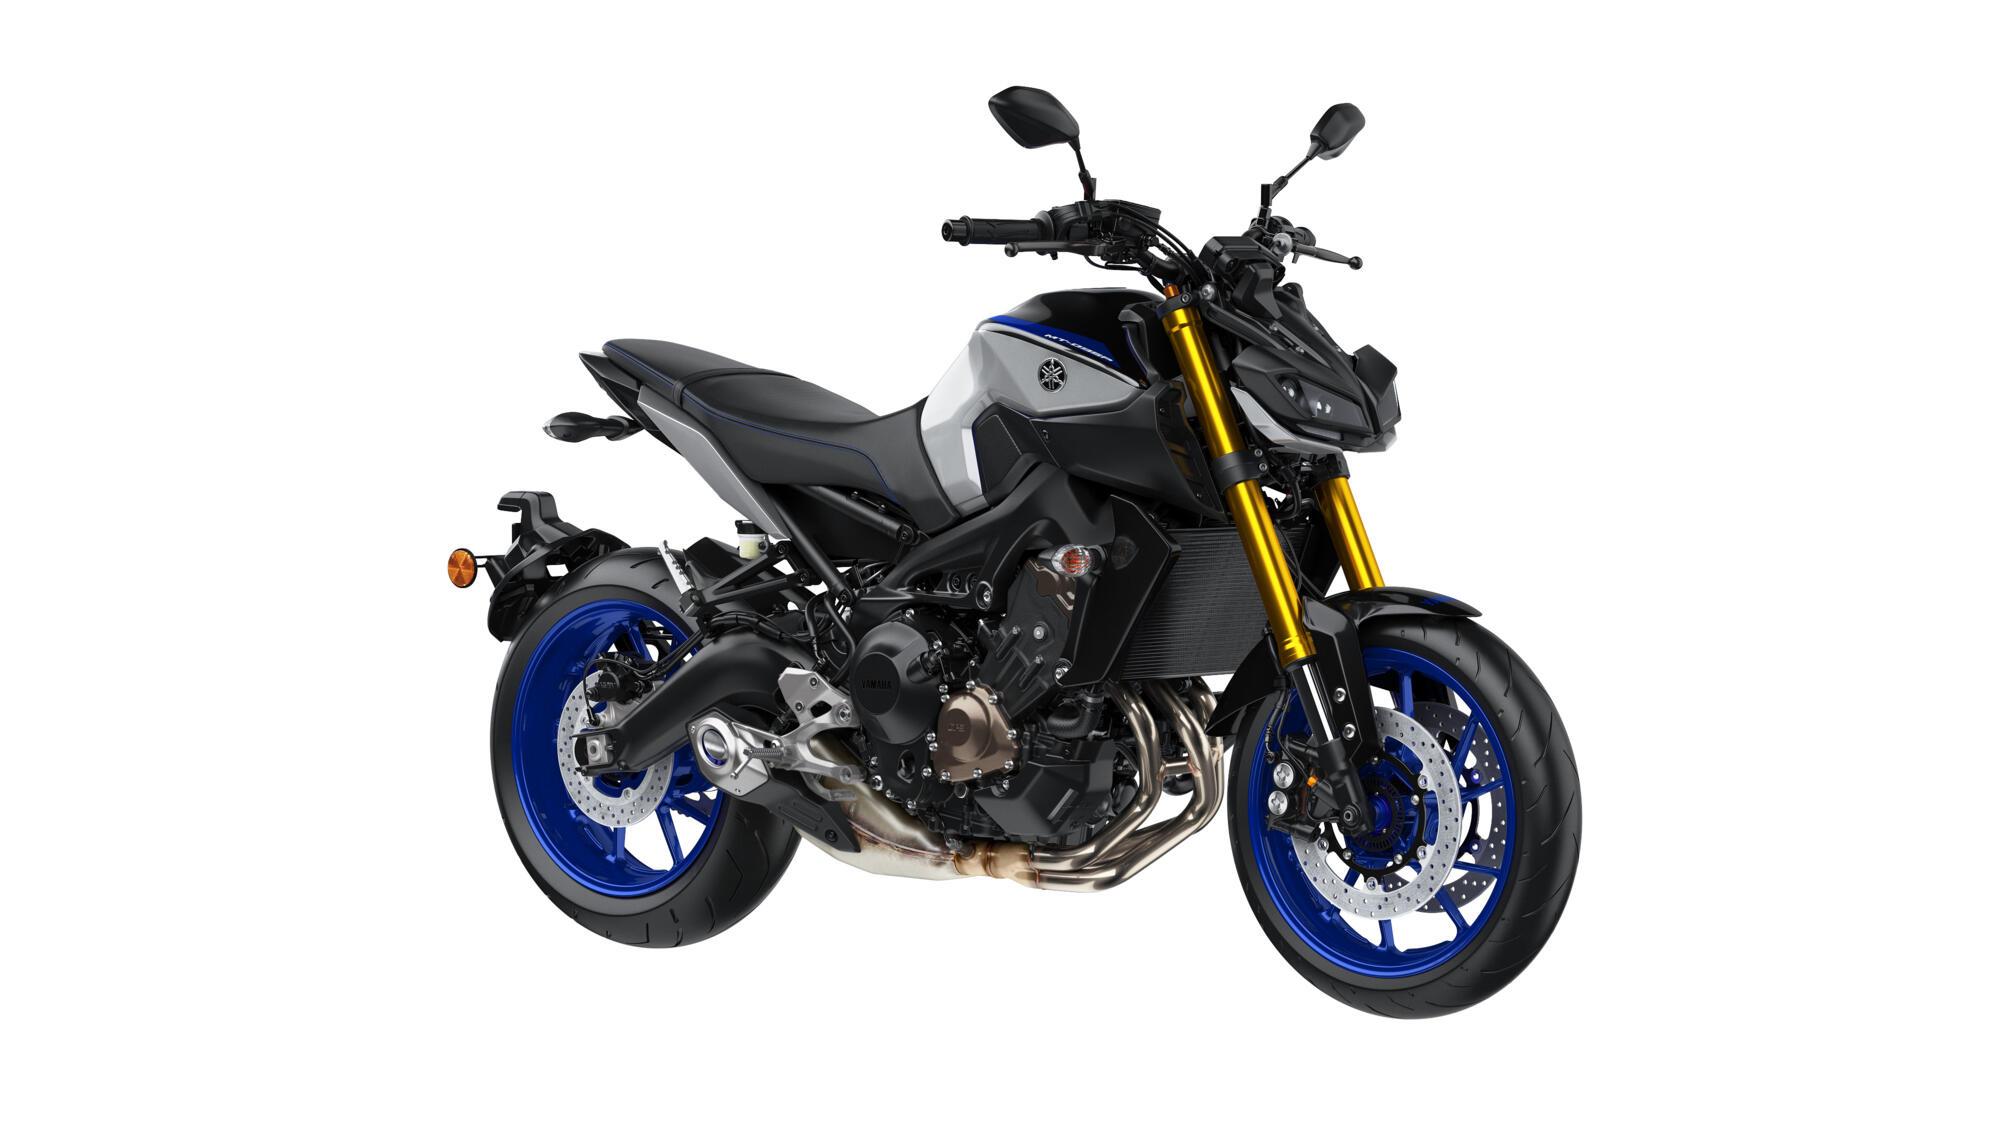 2018-Yamaha-MT09DX-EU-Silver_Blu_Carbon-Studio-001-03